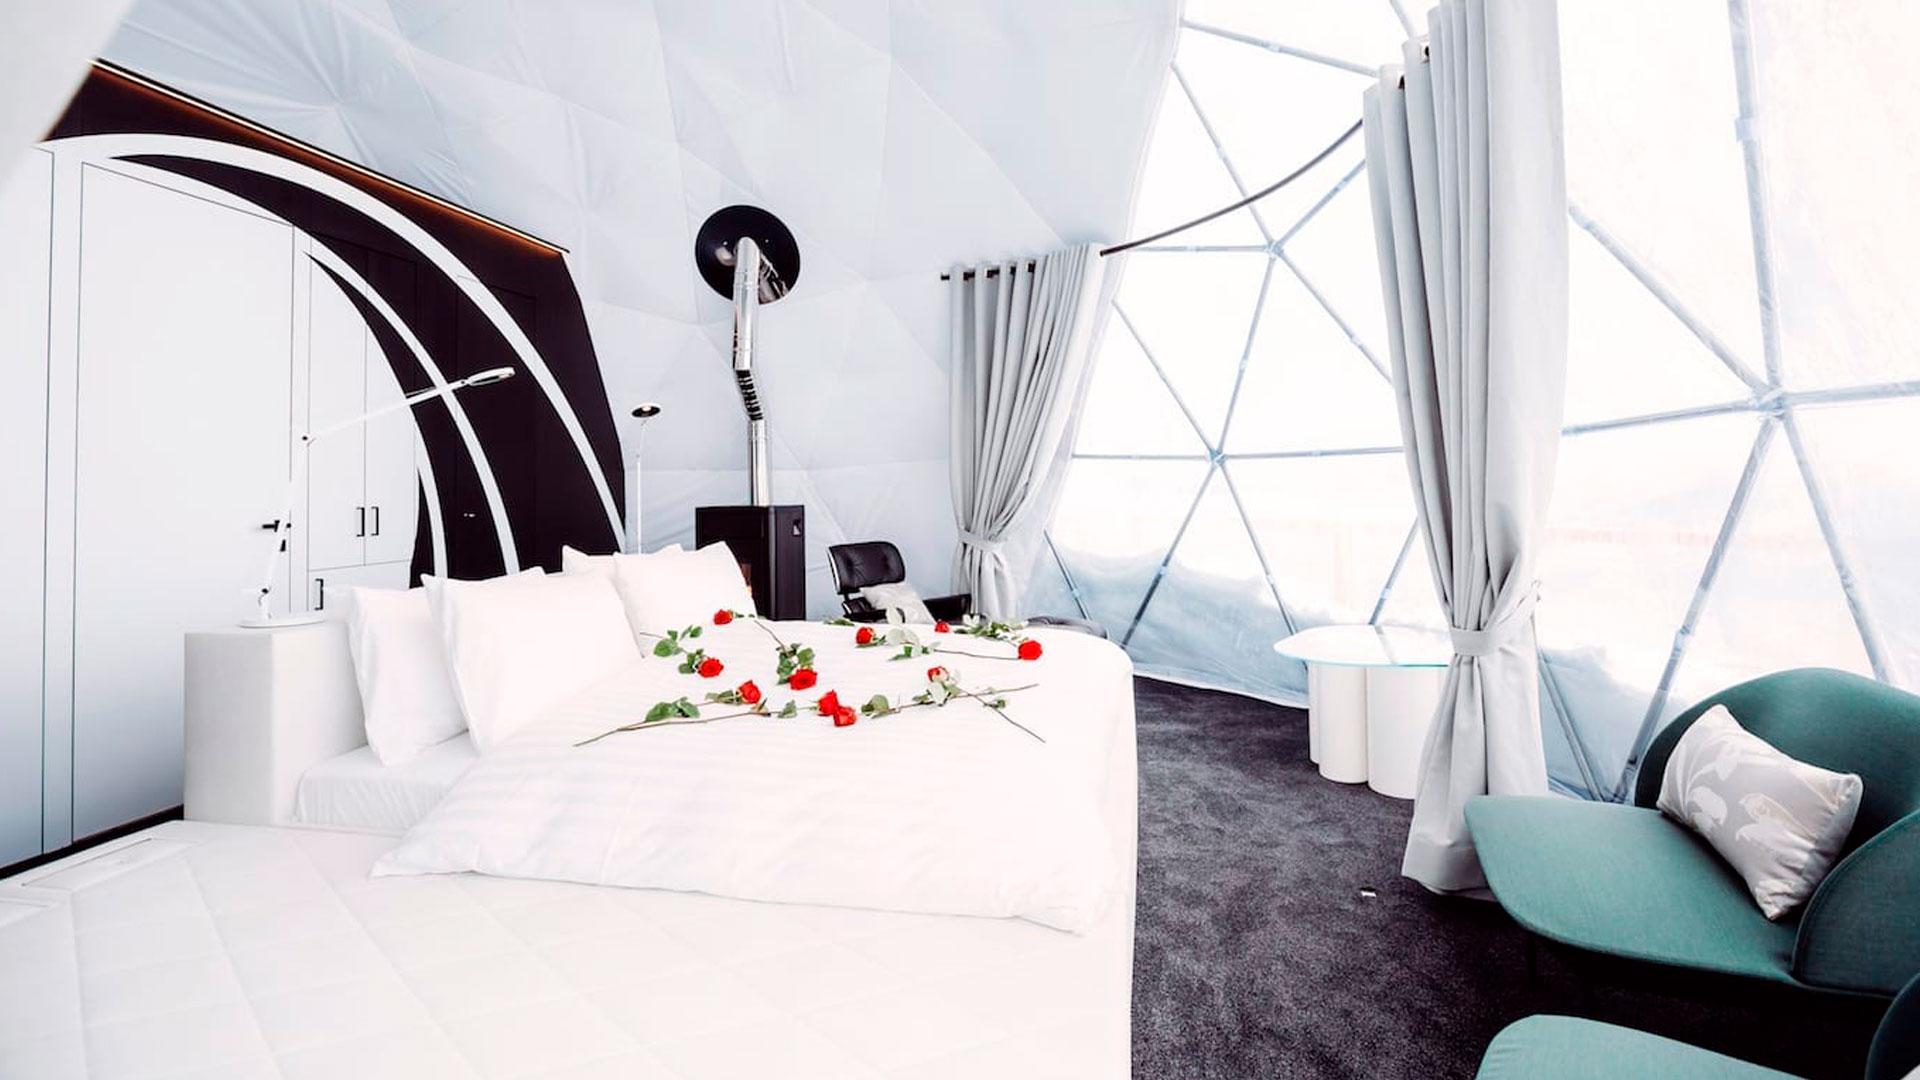 Imagen del Whitepod eco luxury hotel